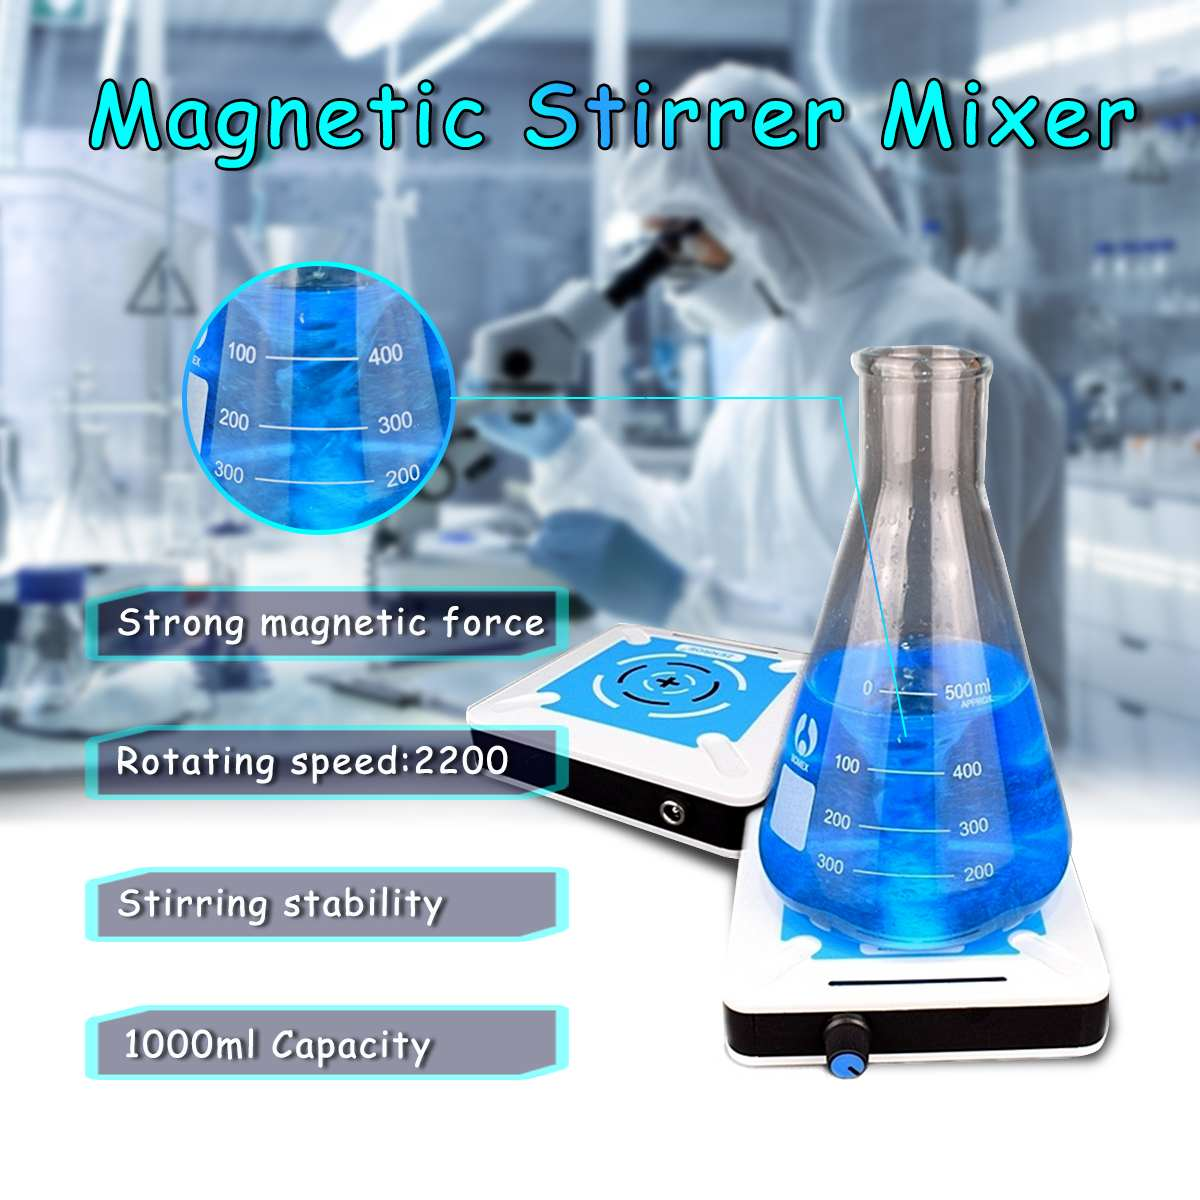 1L 1000ML 0-2200r/min Magnetic Stirrer Mixer With Stirring Bar Agitator Laboratory Miniature Speed Magnetic Stirrer Mini Mixer